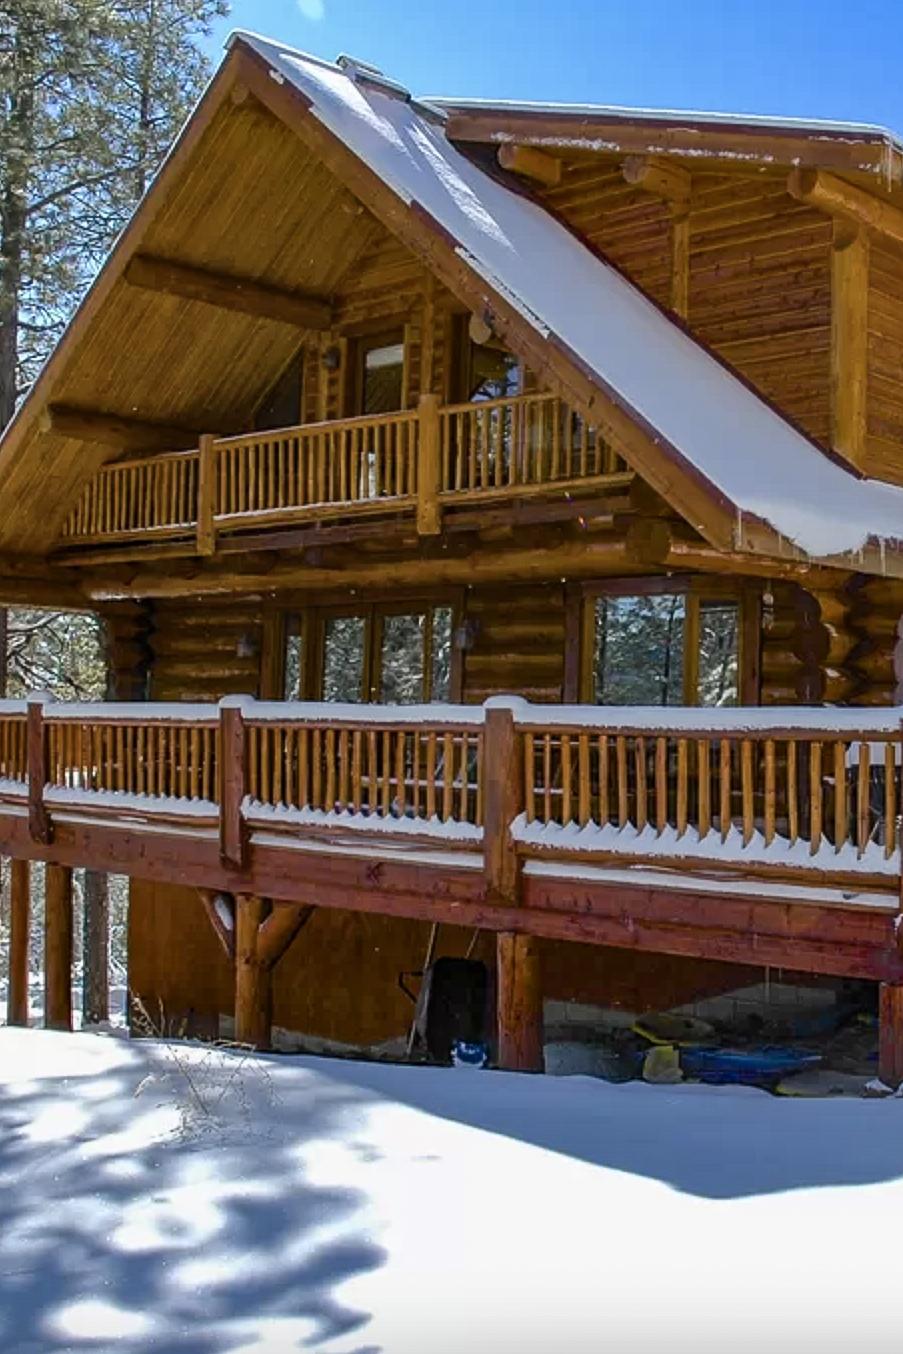 12 Best Flagstaff Cabin Rentals To Escape To In 2020 In 2020 Cabin Rentals Cabin Flagstaff Cabin Rentals